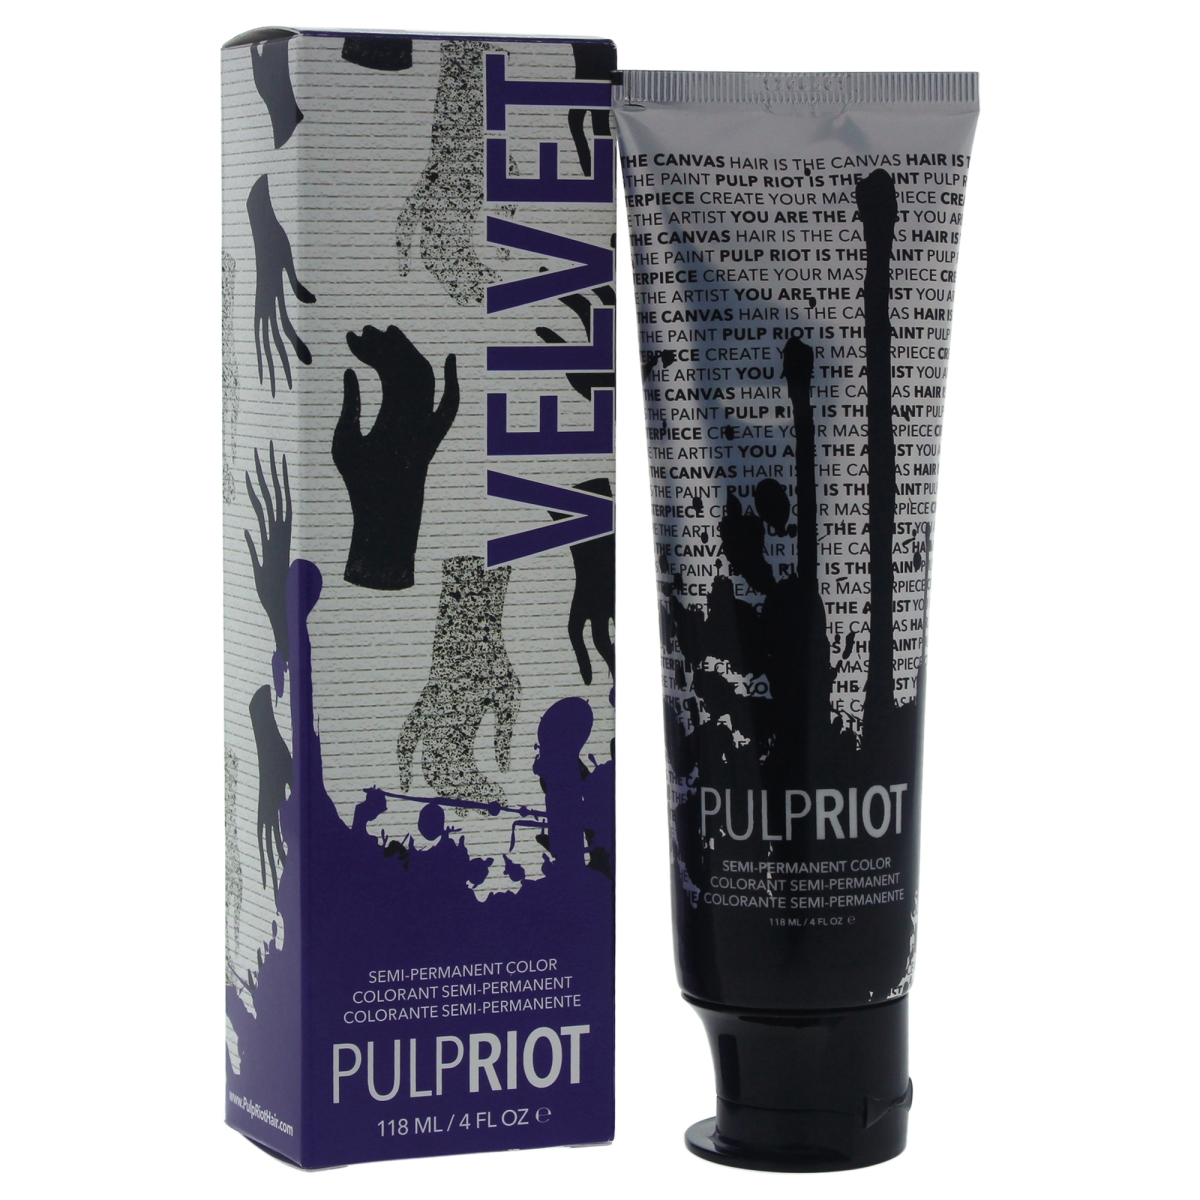 Pulp Riot U-HC-11670 4 oz Velvet Egg Plant Hair Color for Unisex